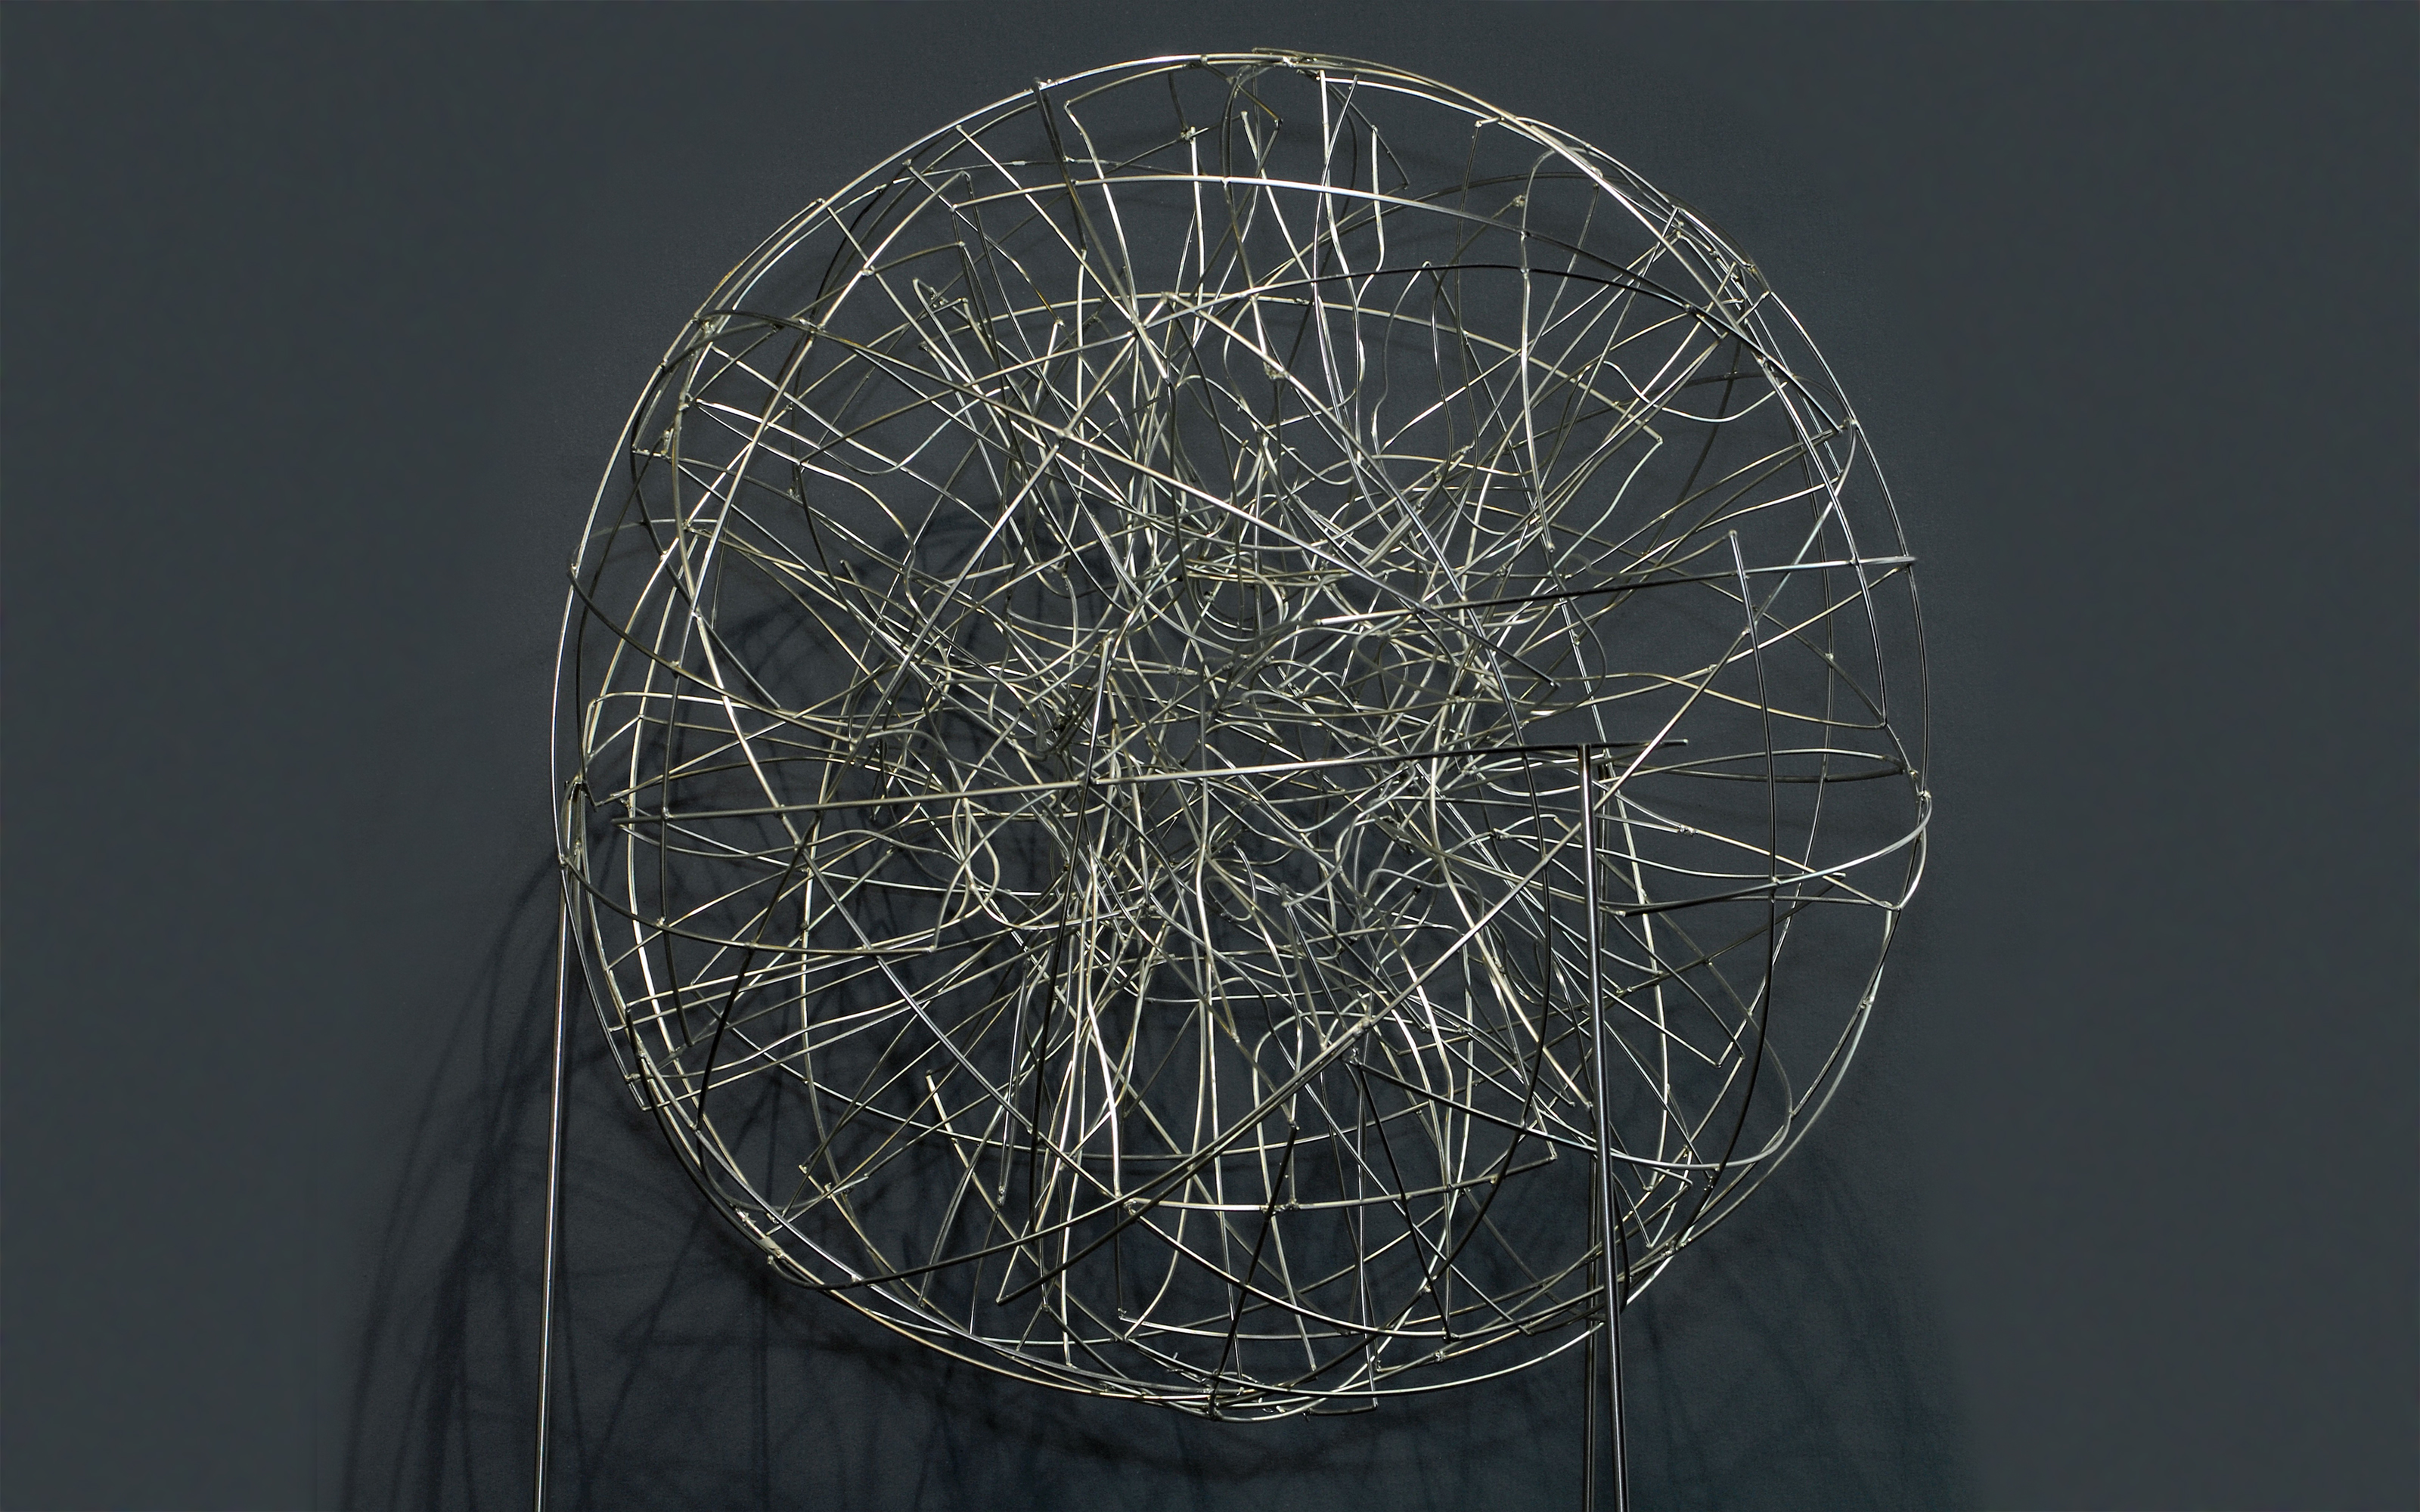 """Introplasma"", Edelstahldraht, 70 x 70 x 70 cm, 2007"